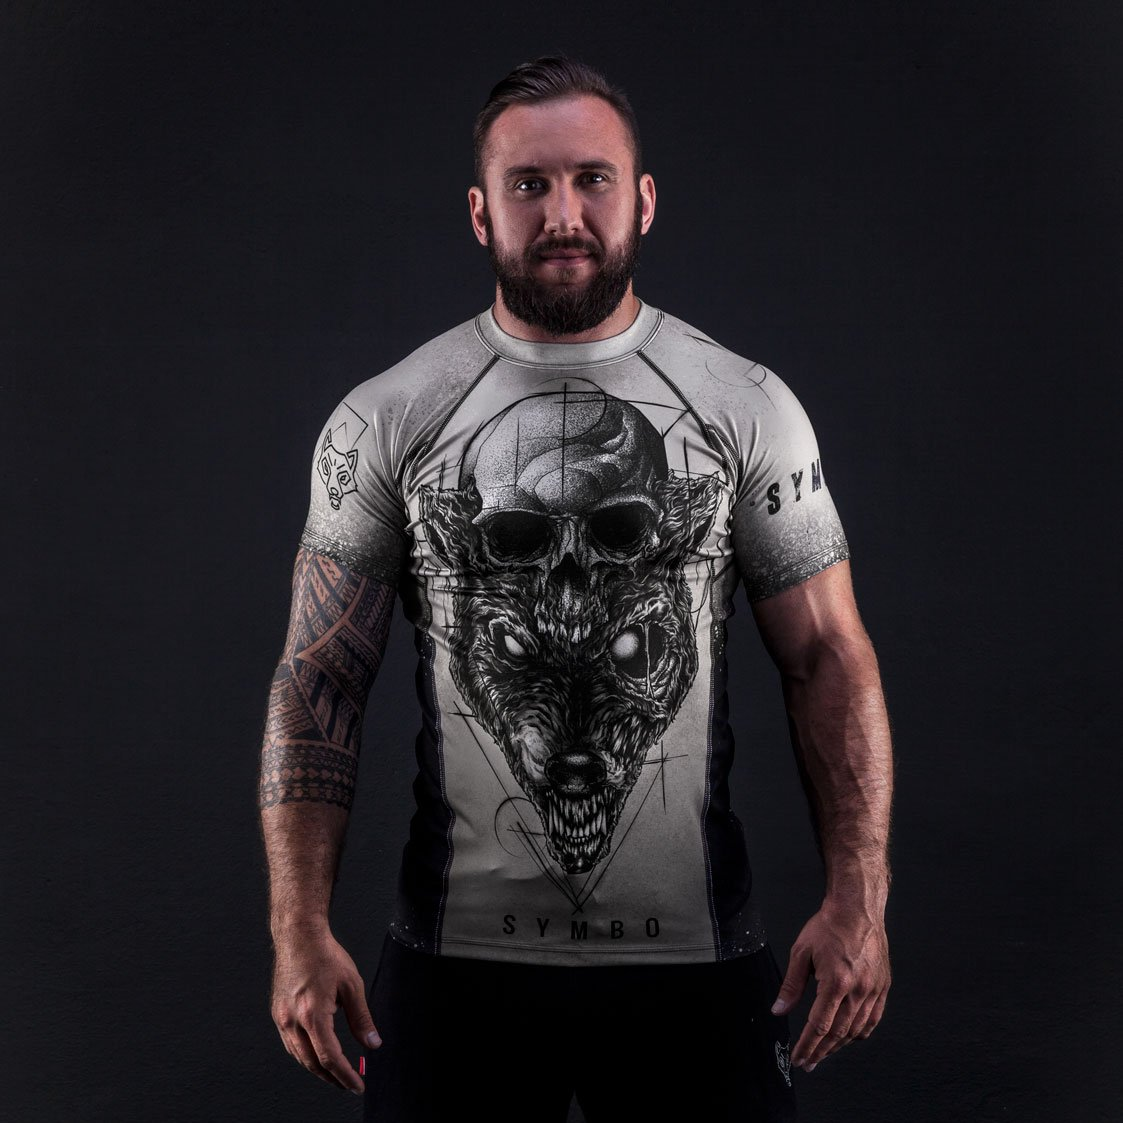 Symbo T-Shirt Herren Rashguard Animal Tattoo thermoaktiv Kompression Stretch Sport Fitness Training Kampfsport